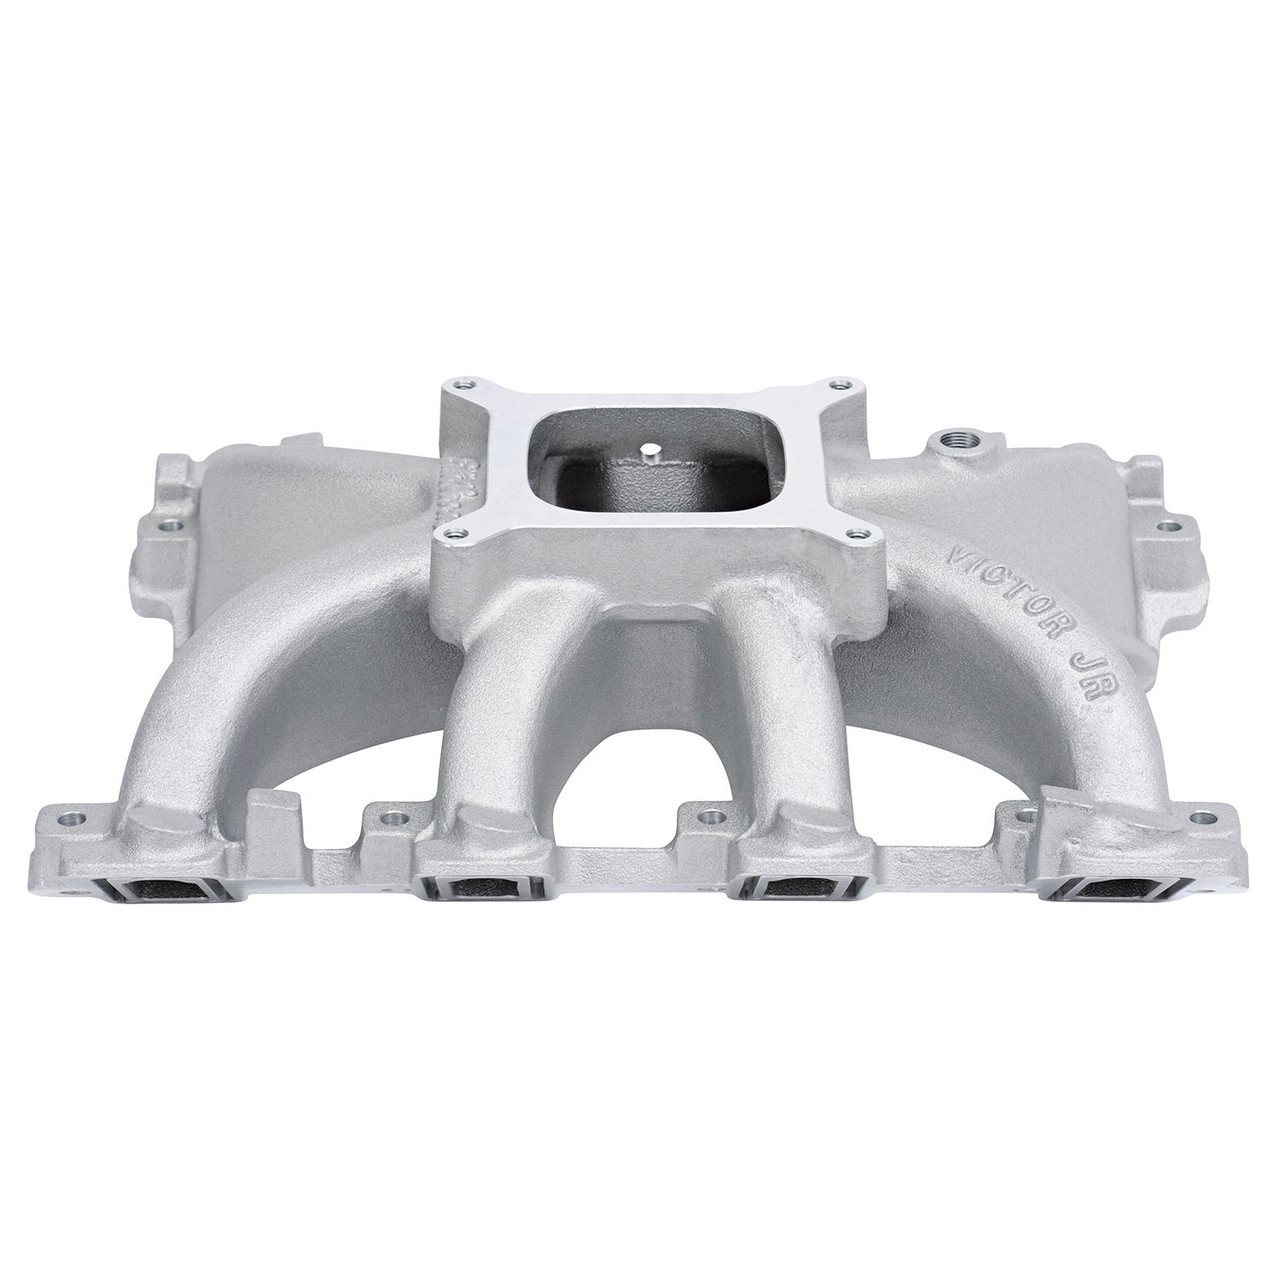 Edelbrock Victor Jr | LS1/LS2 Port Intake Manifold | Carb Intake